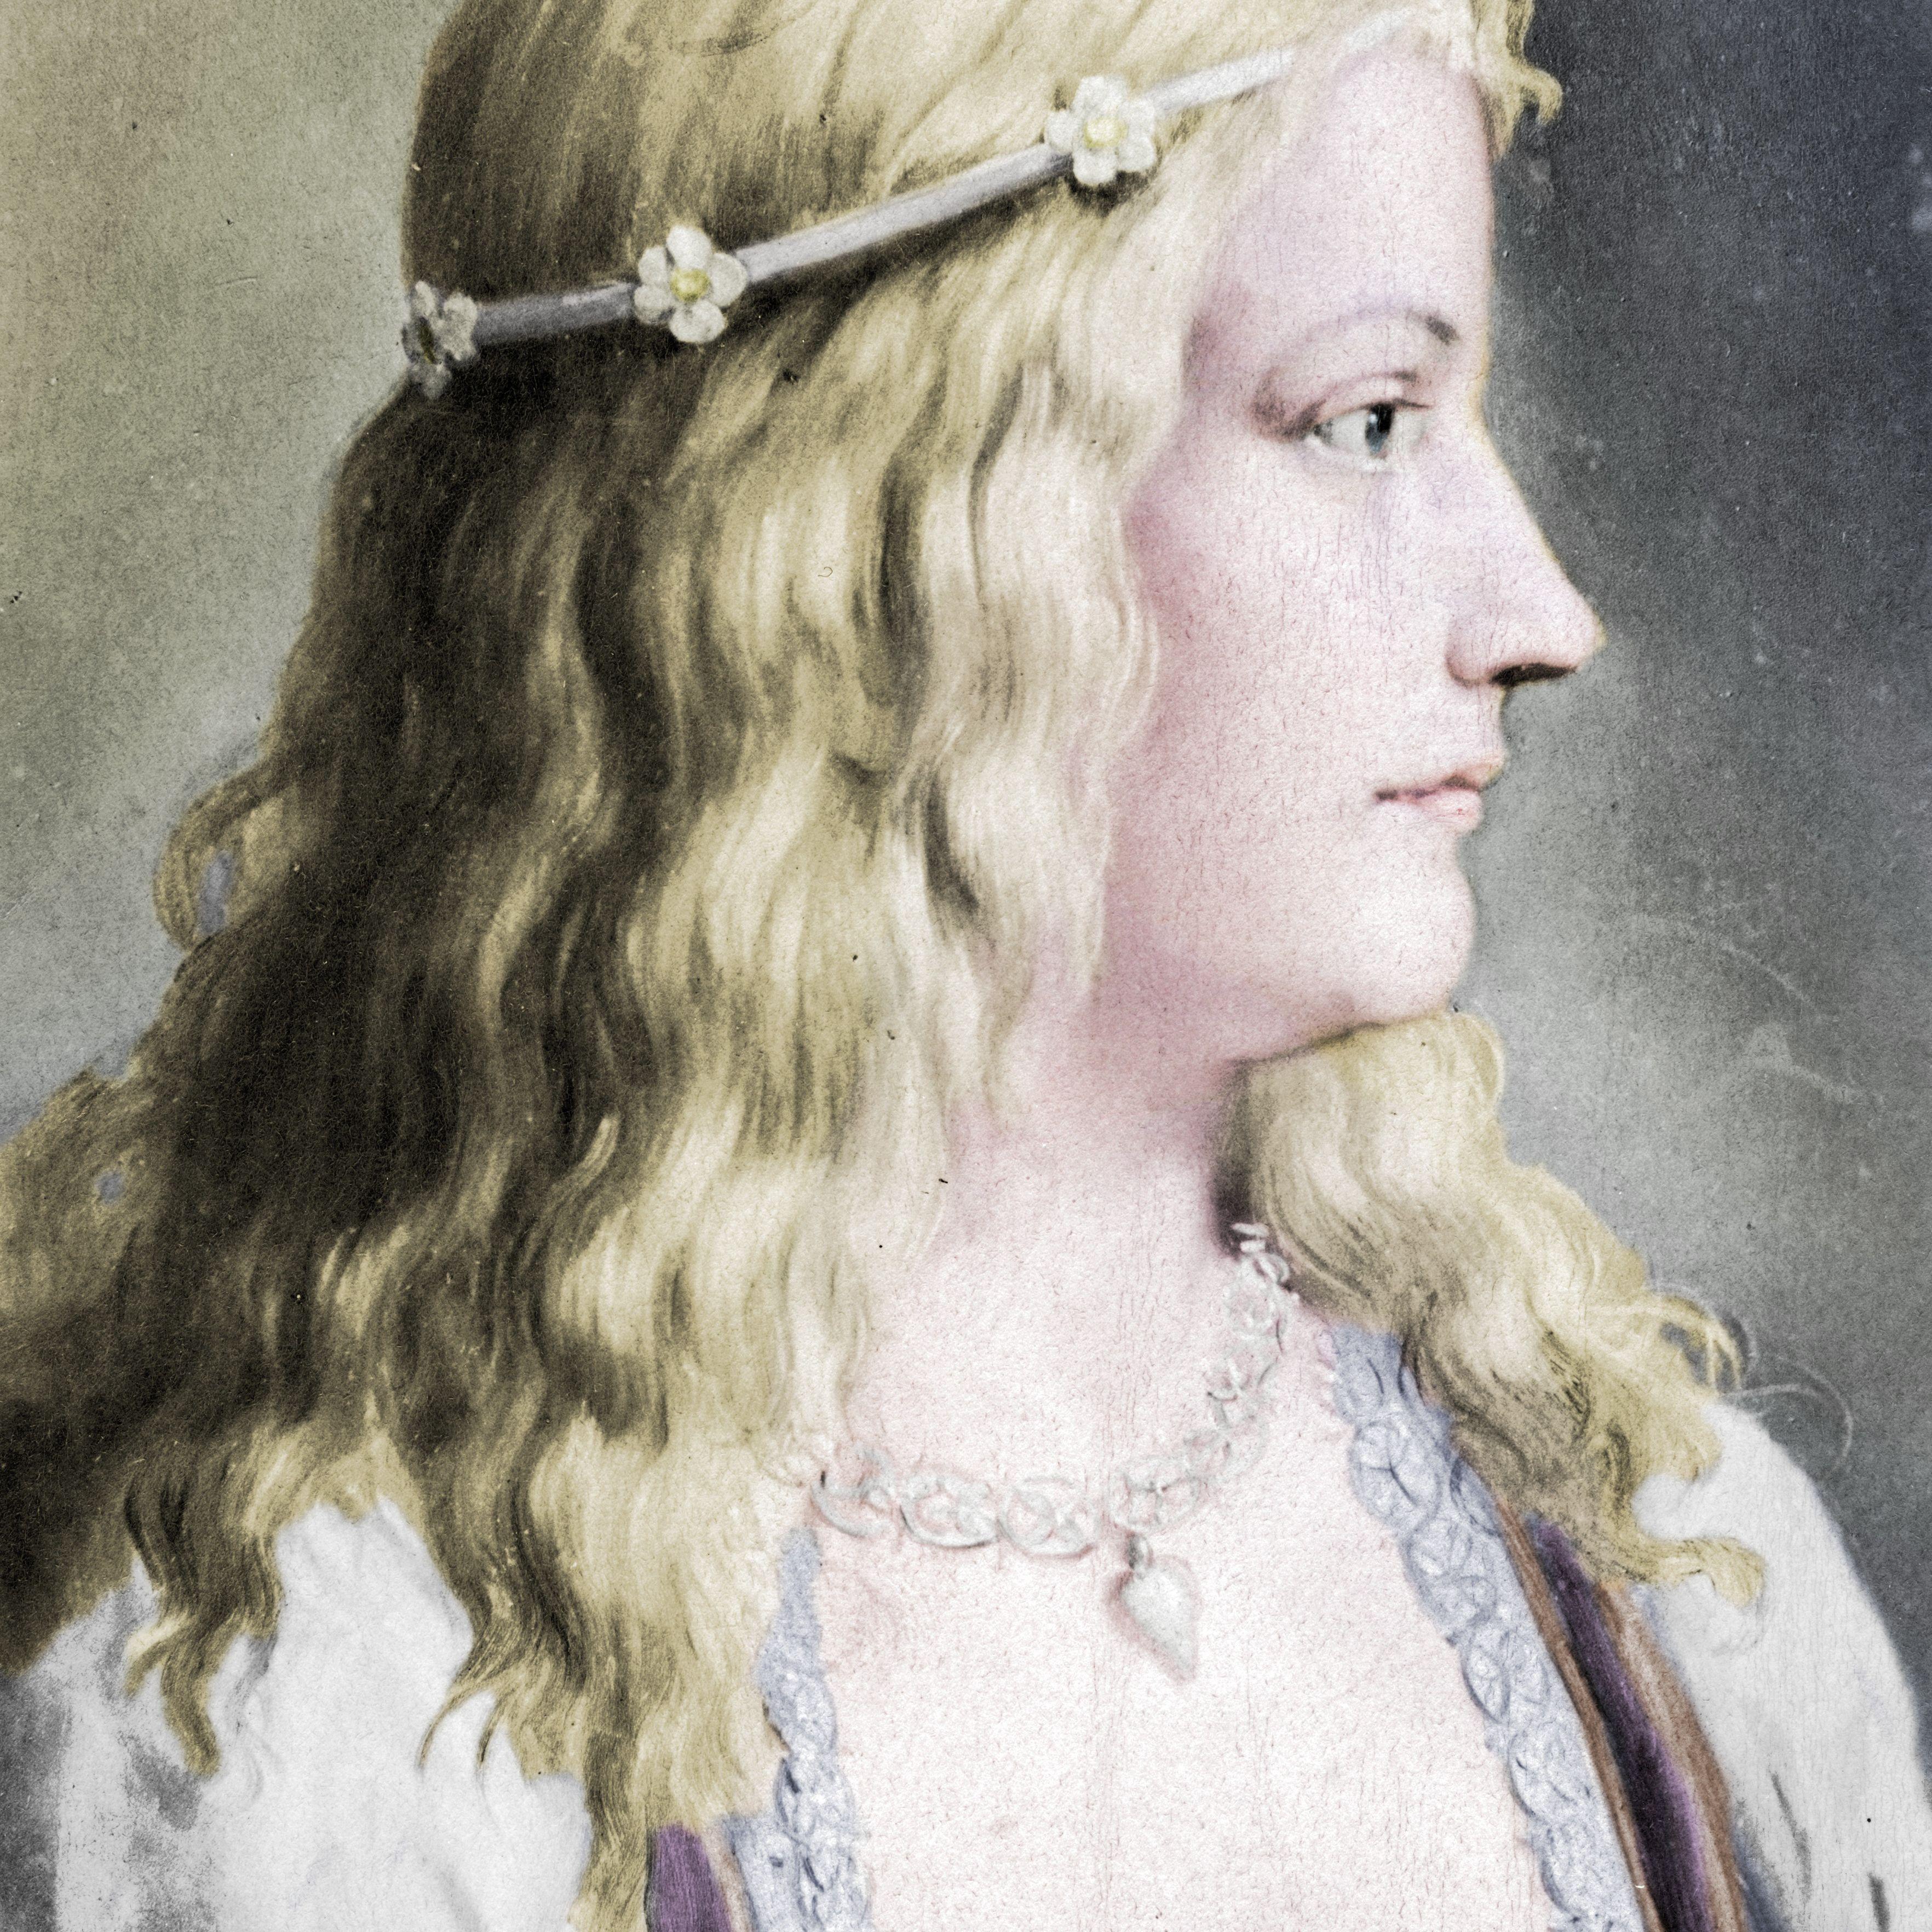 Painting of Lucrezia Borgia facing right.